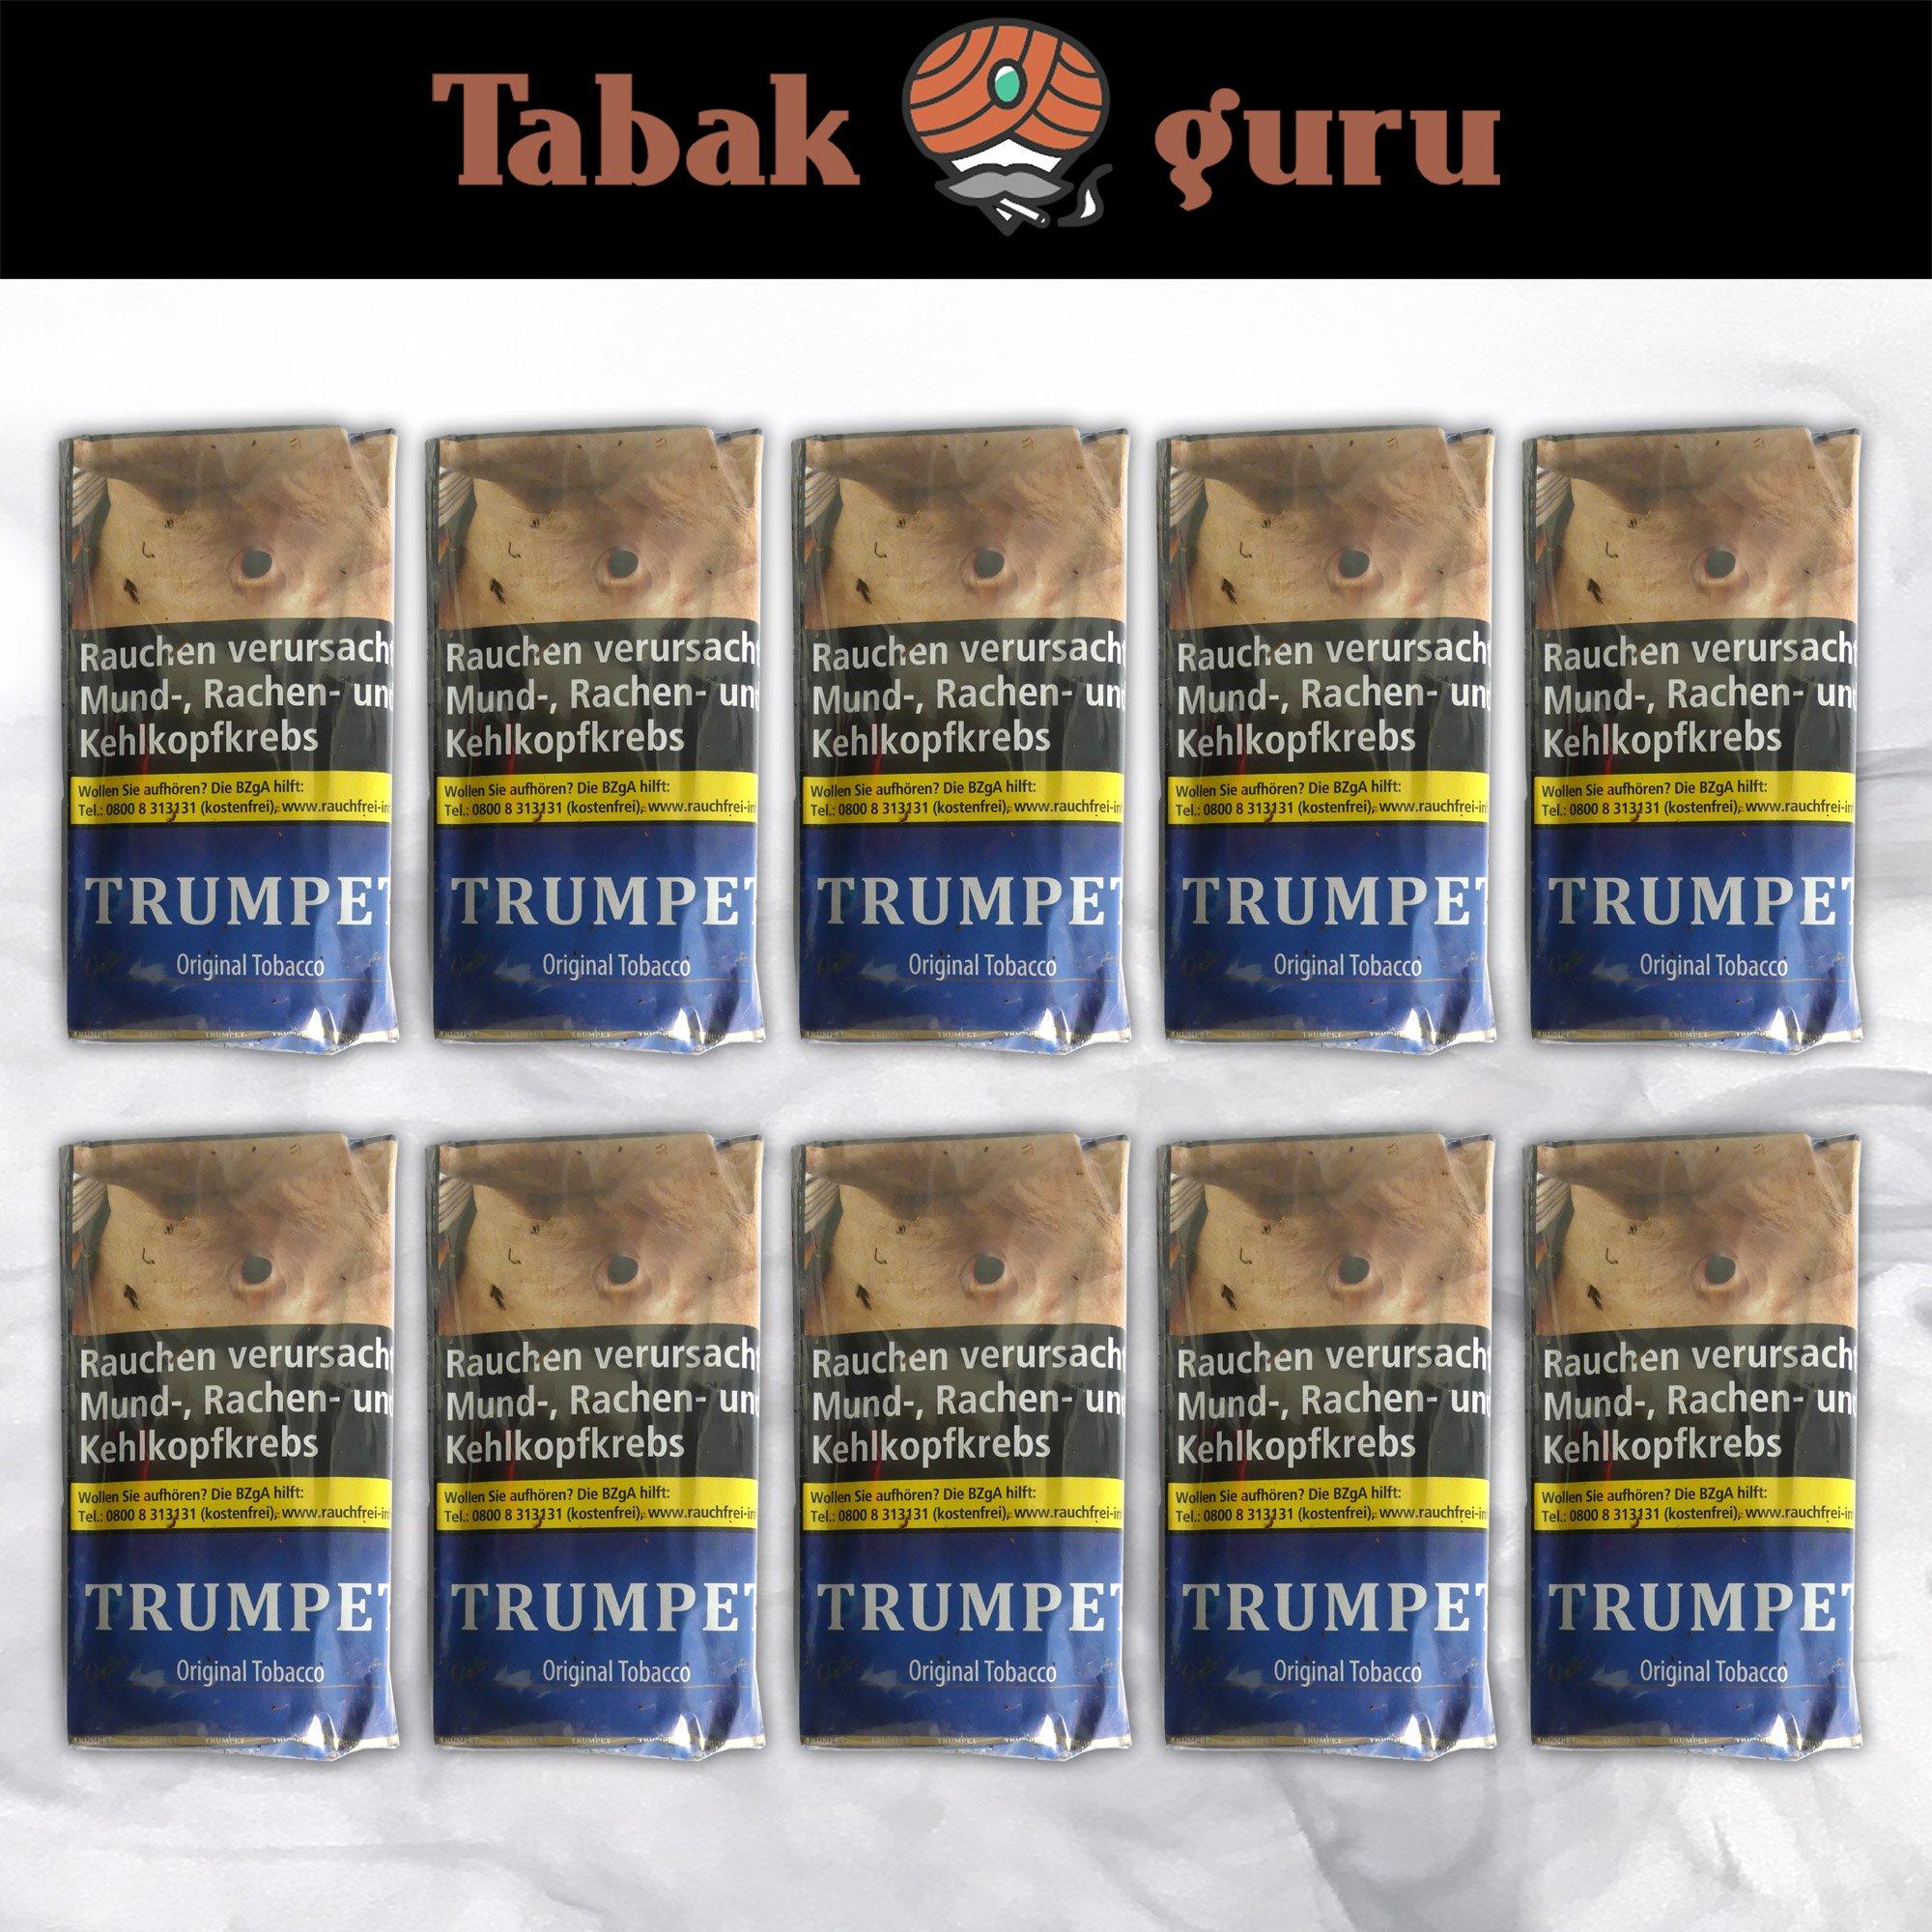 10 x Trumpet Original Tobacco Drehtabak à 38 g